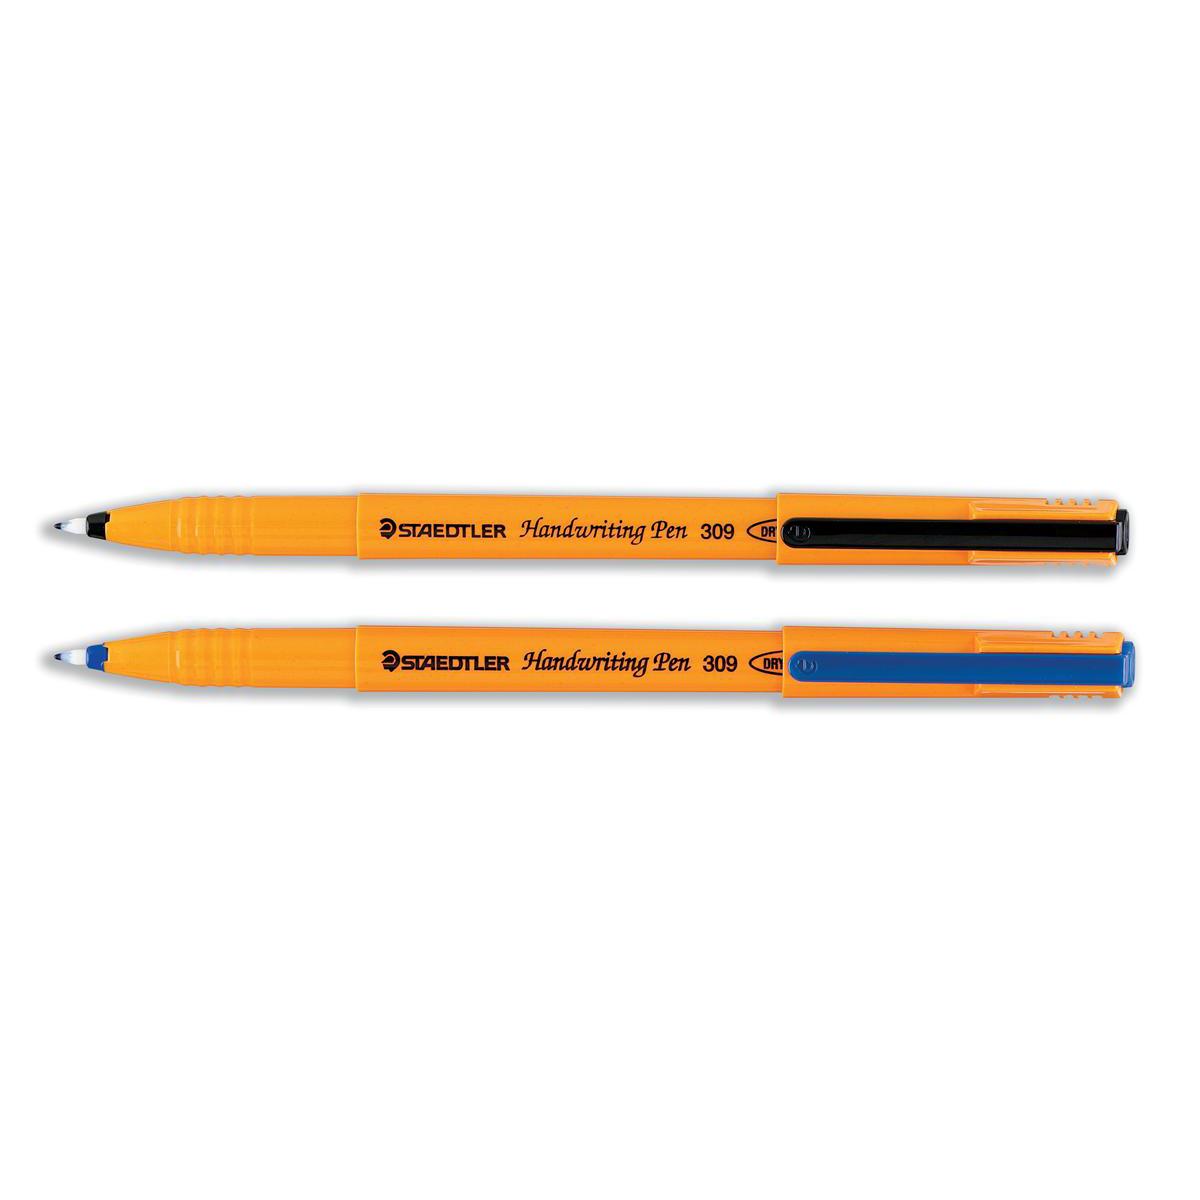 Staedtler 309 Handwriting Pen Fibre Tipped Black Ref 309-9 Pack 100 Bulk Pack Jan-Dec 2018